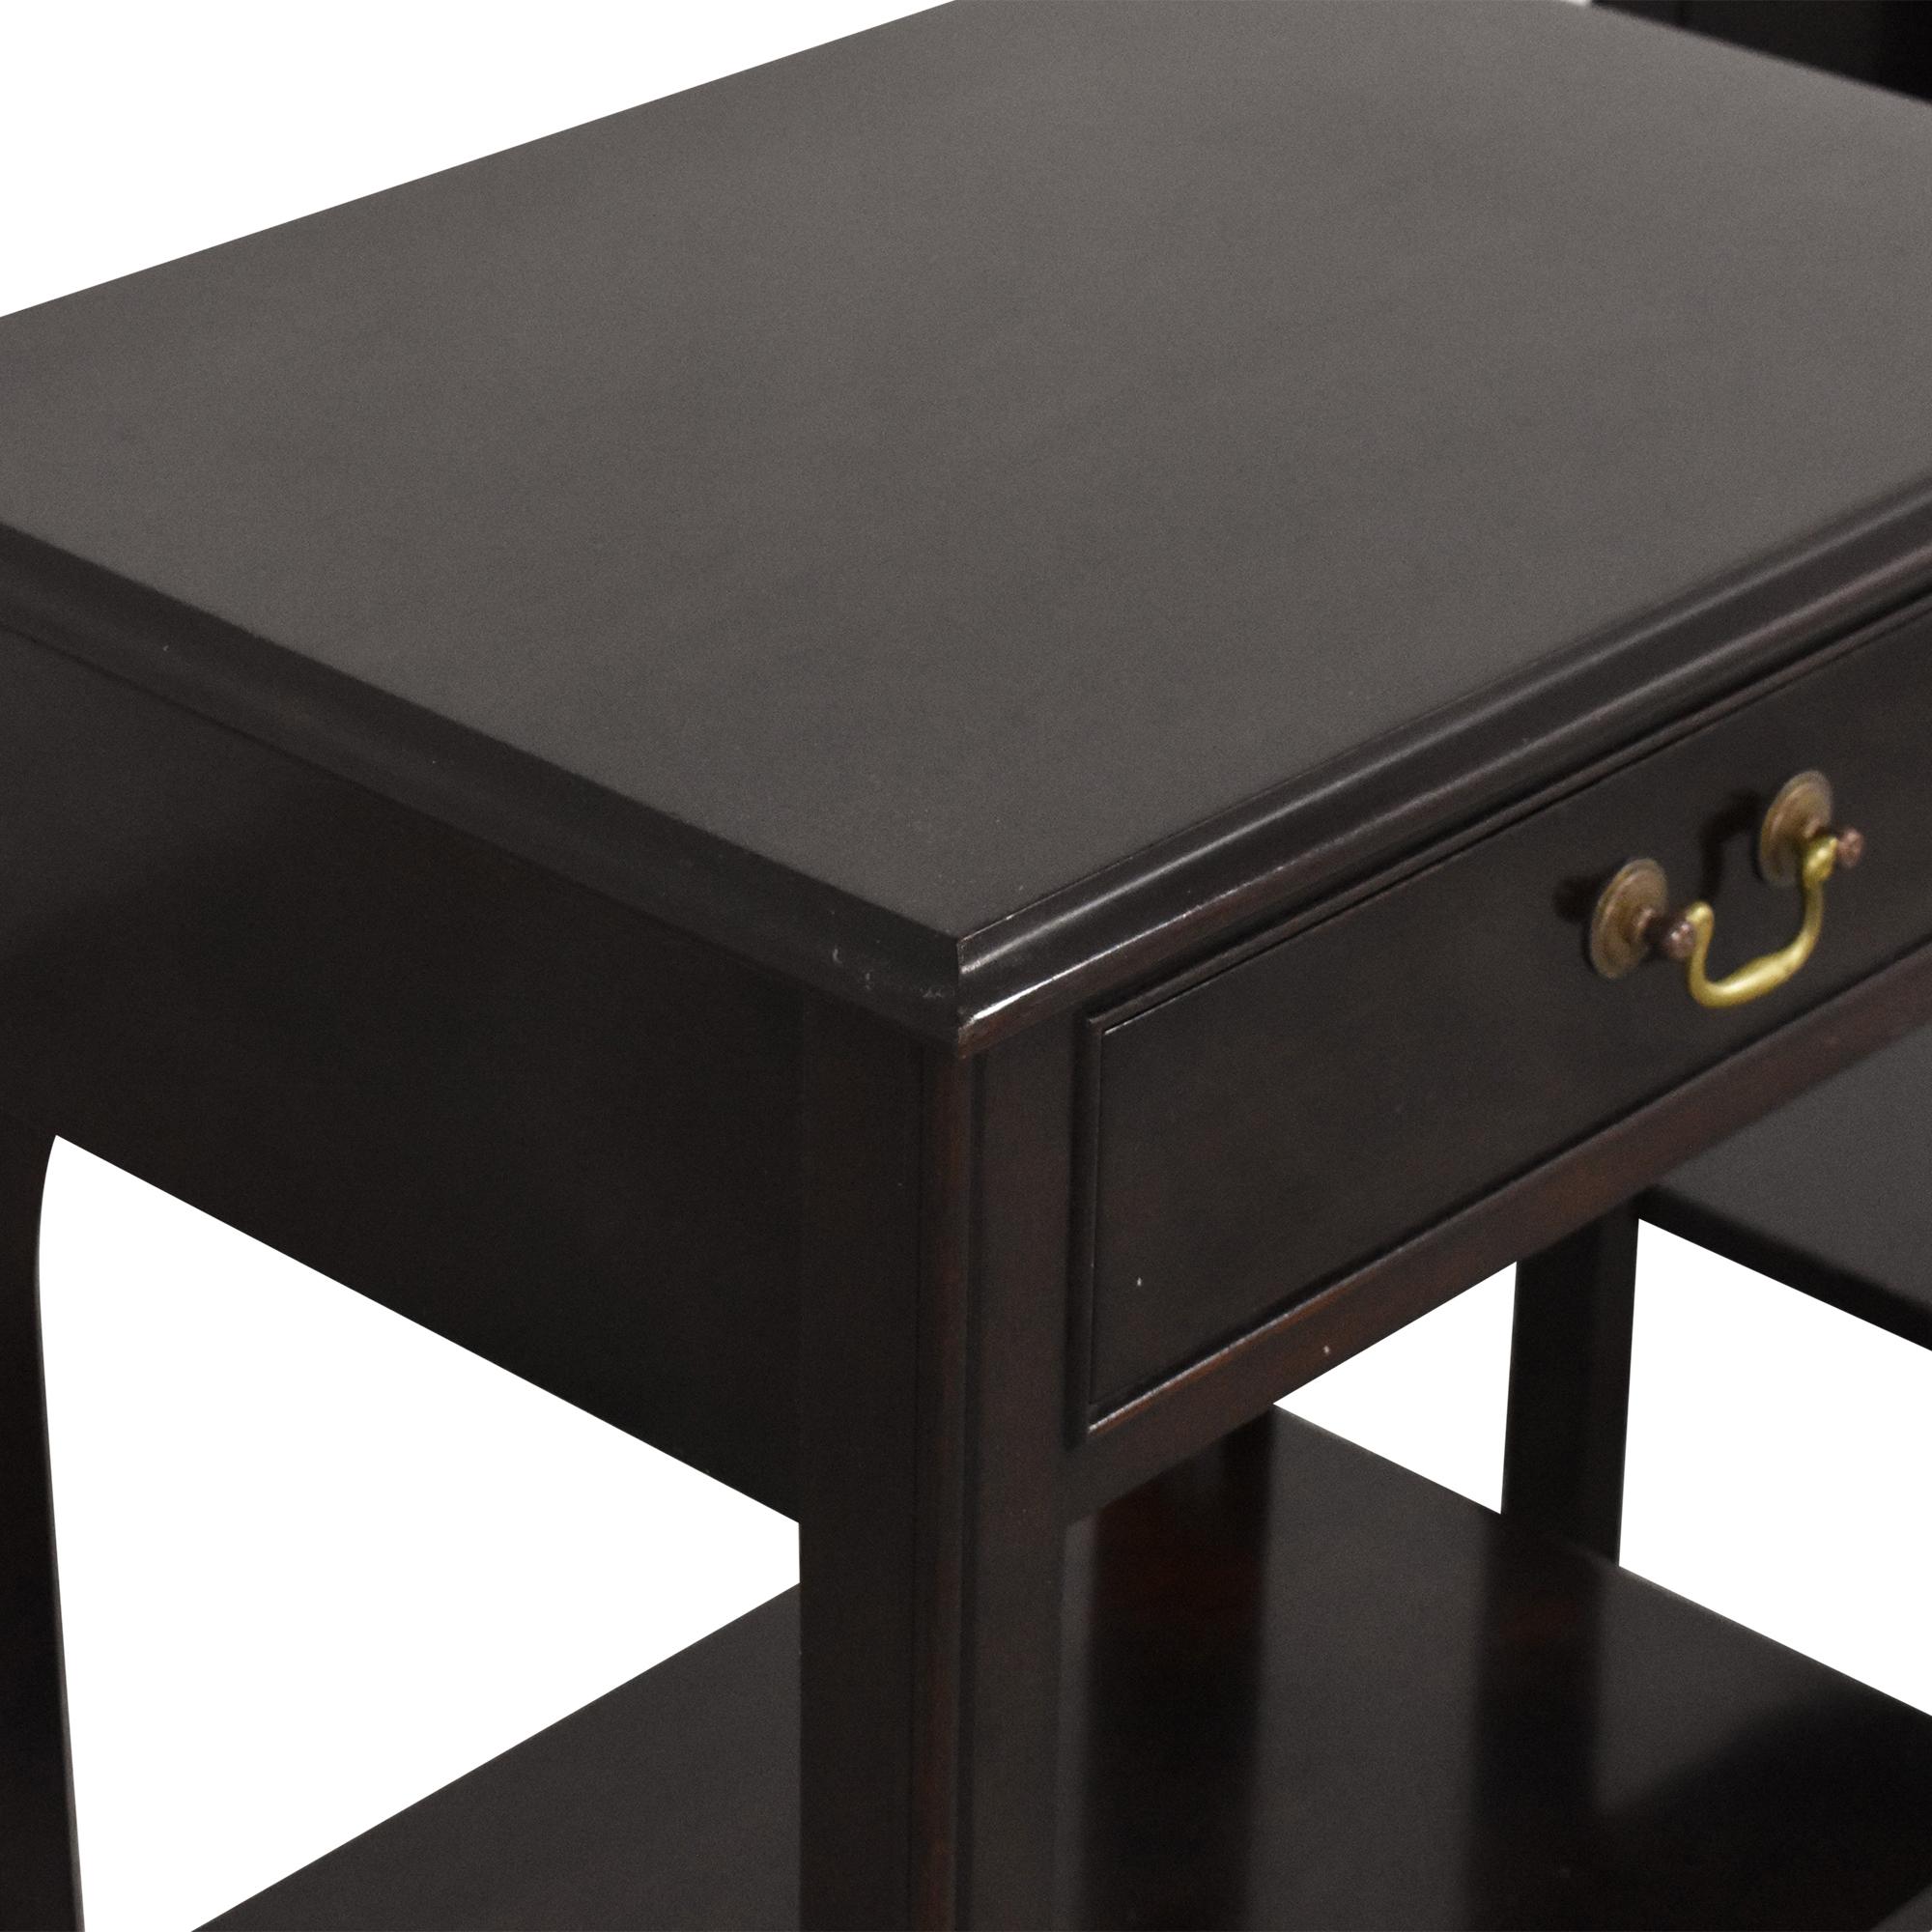 buy Stickley Furniture Stickley Furniture Nightstands online